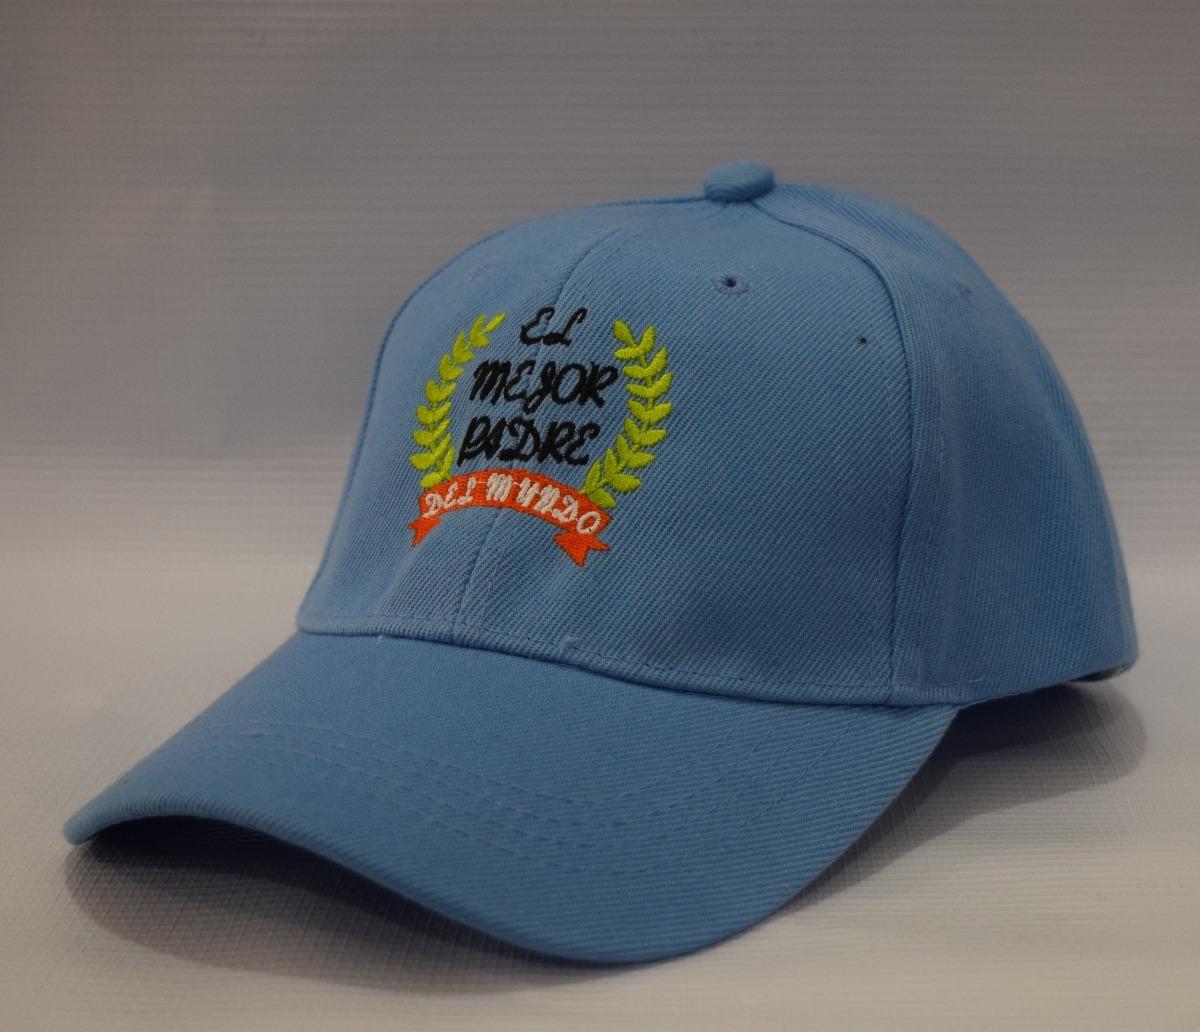 Gorras Personalizadas Bordadas Dia Del Padre O Papa -   45.00 en ... 7d2c780557d